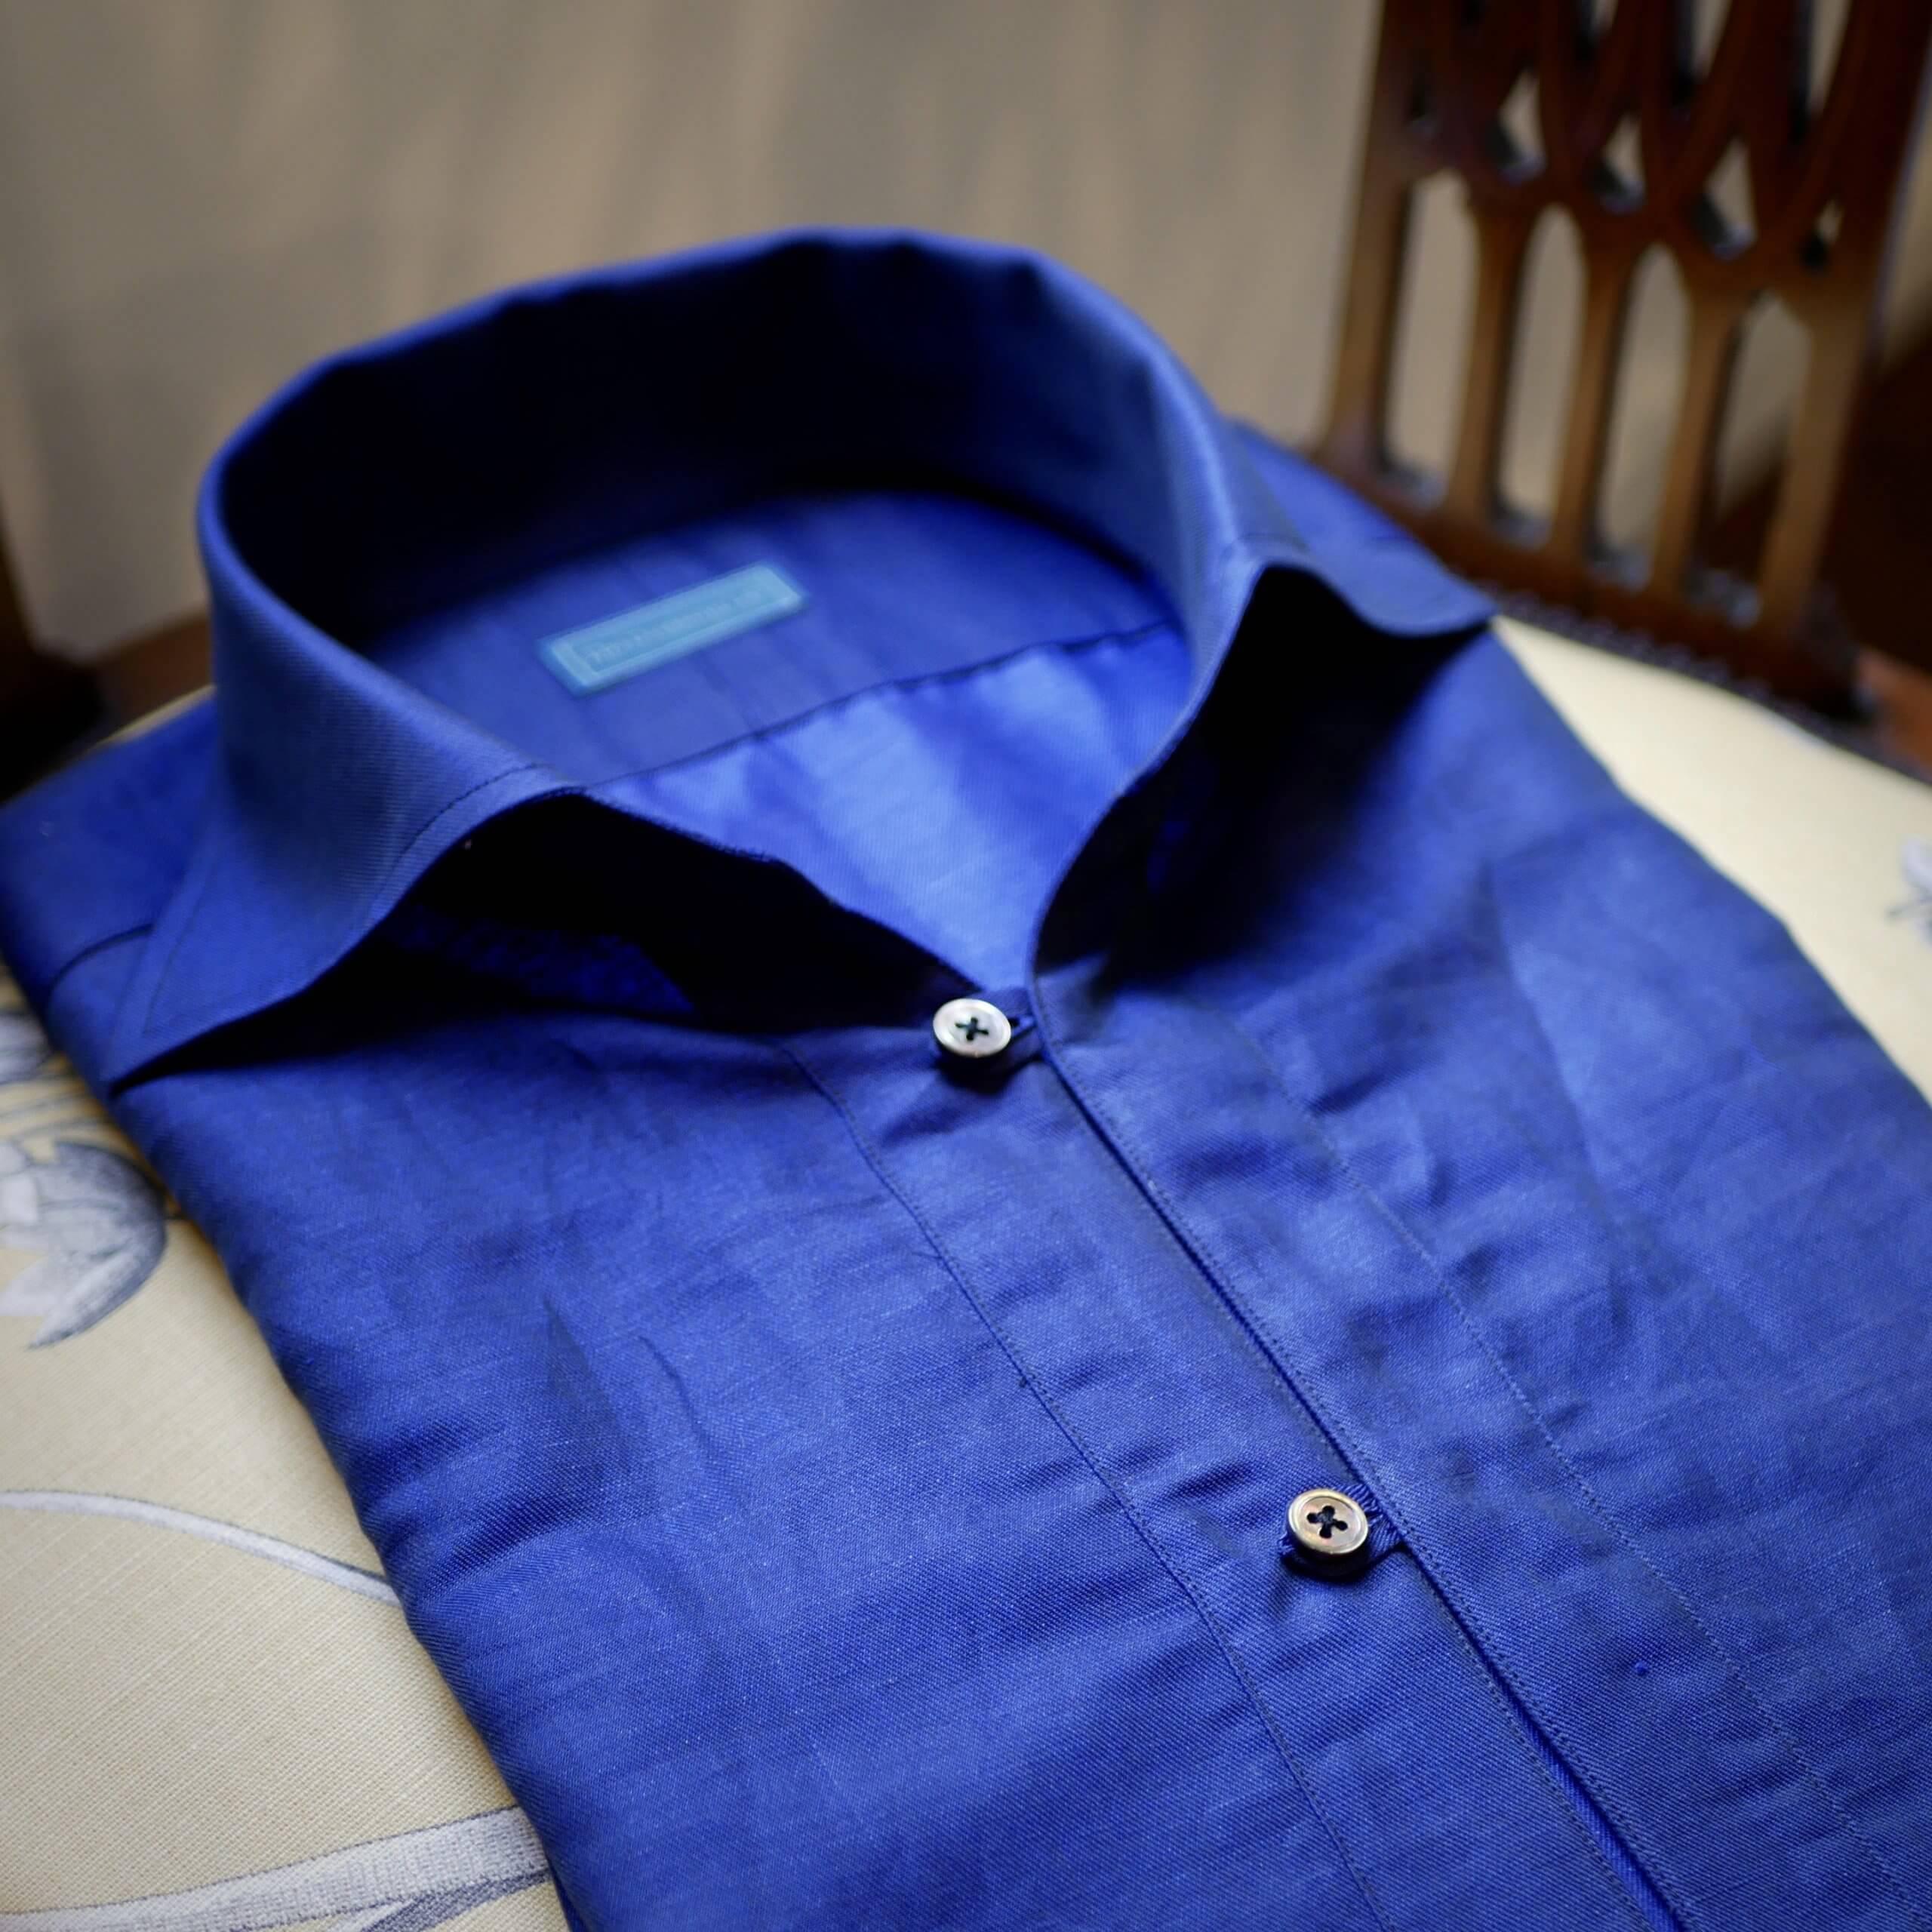 Shirts_20201019_spShirts_06.jpg